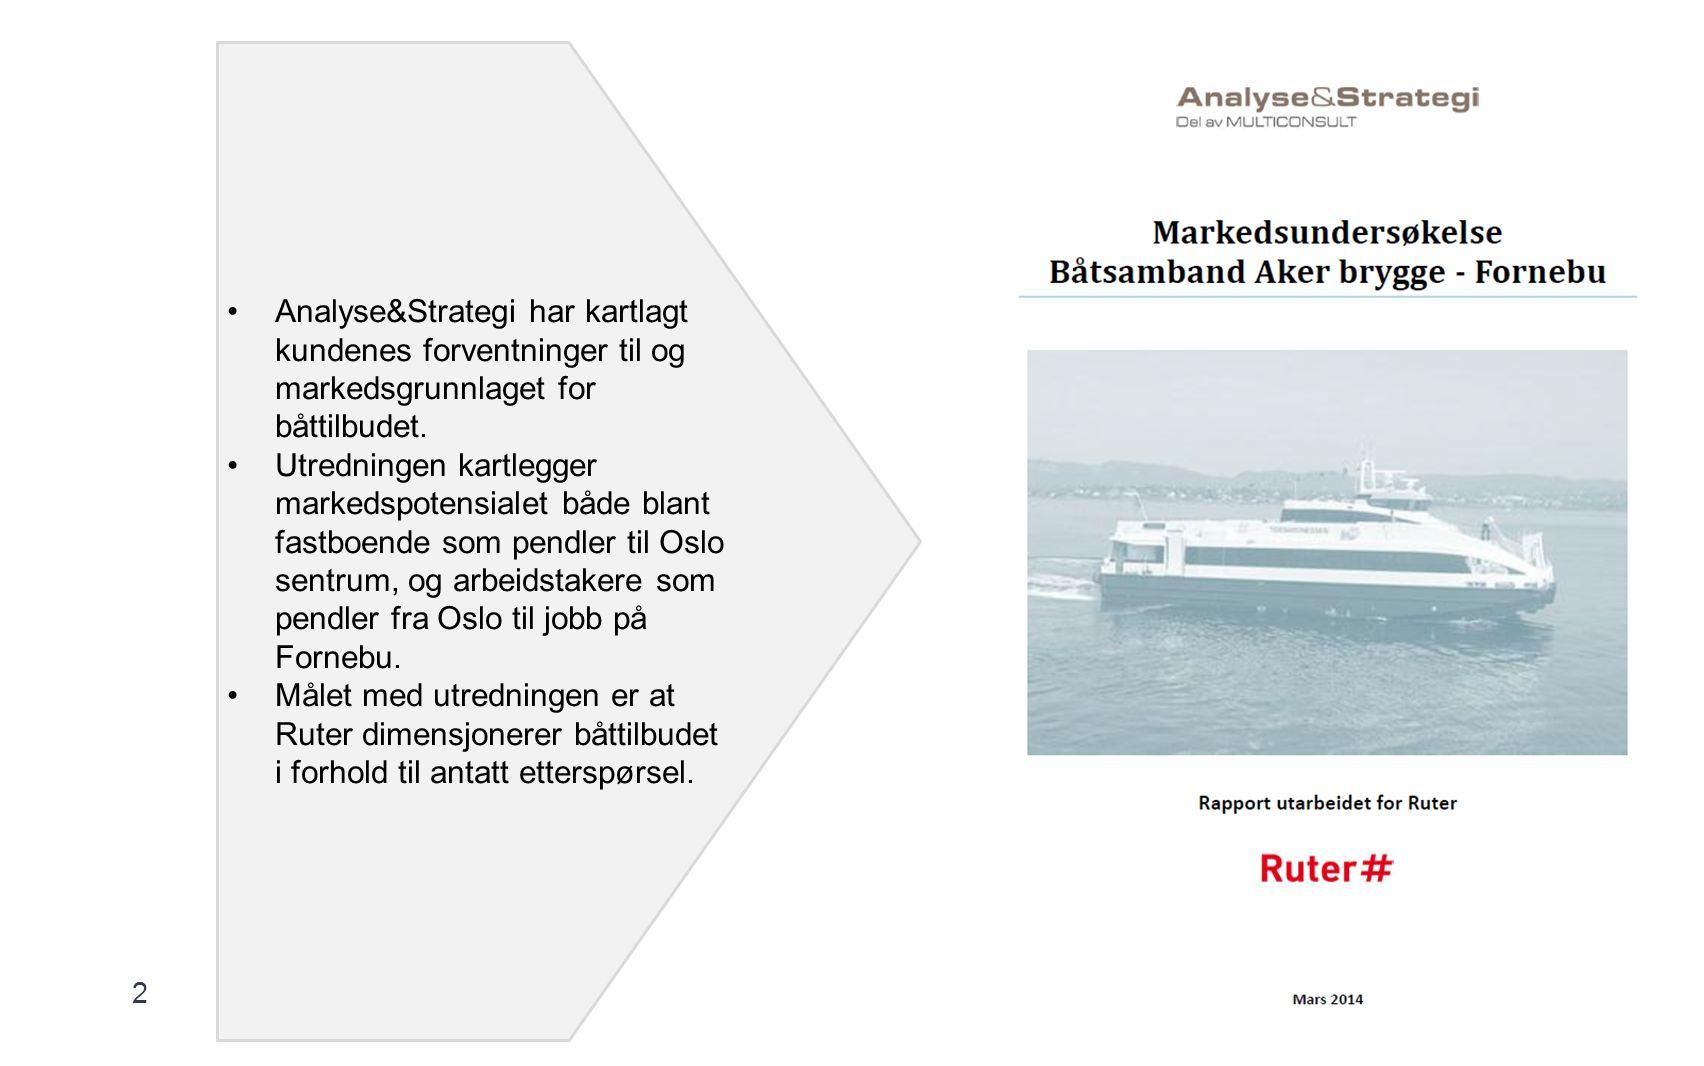 2 Analyse&Strategi har kartlagt kundenes forventninger til og markedsgrunnlaget for båttilbudet.